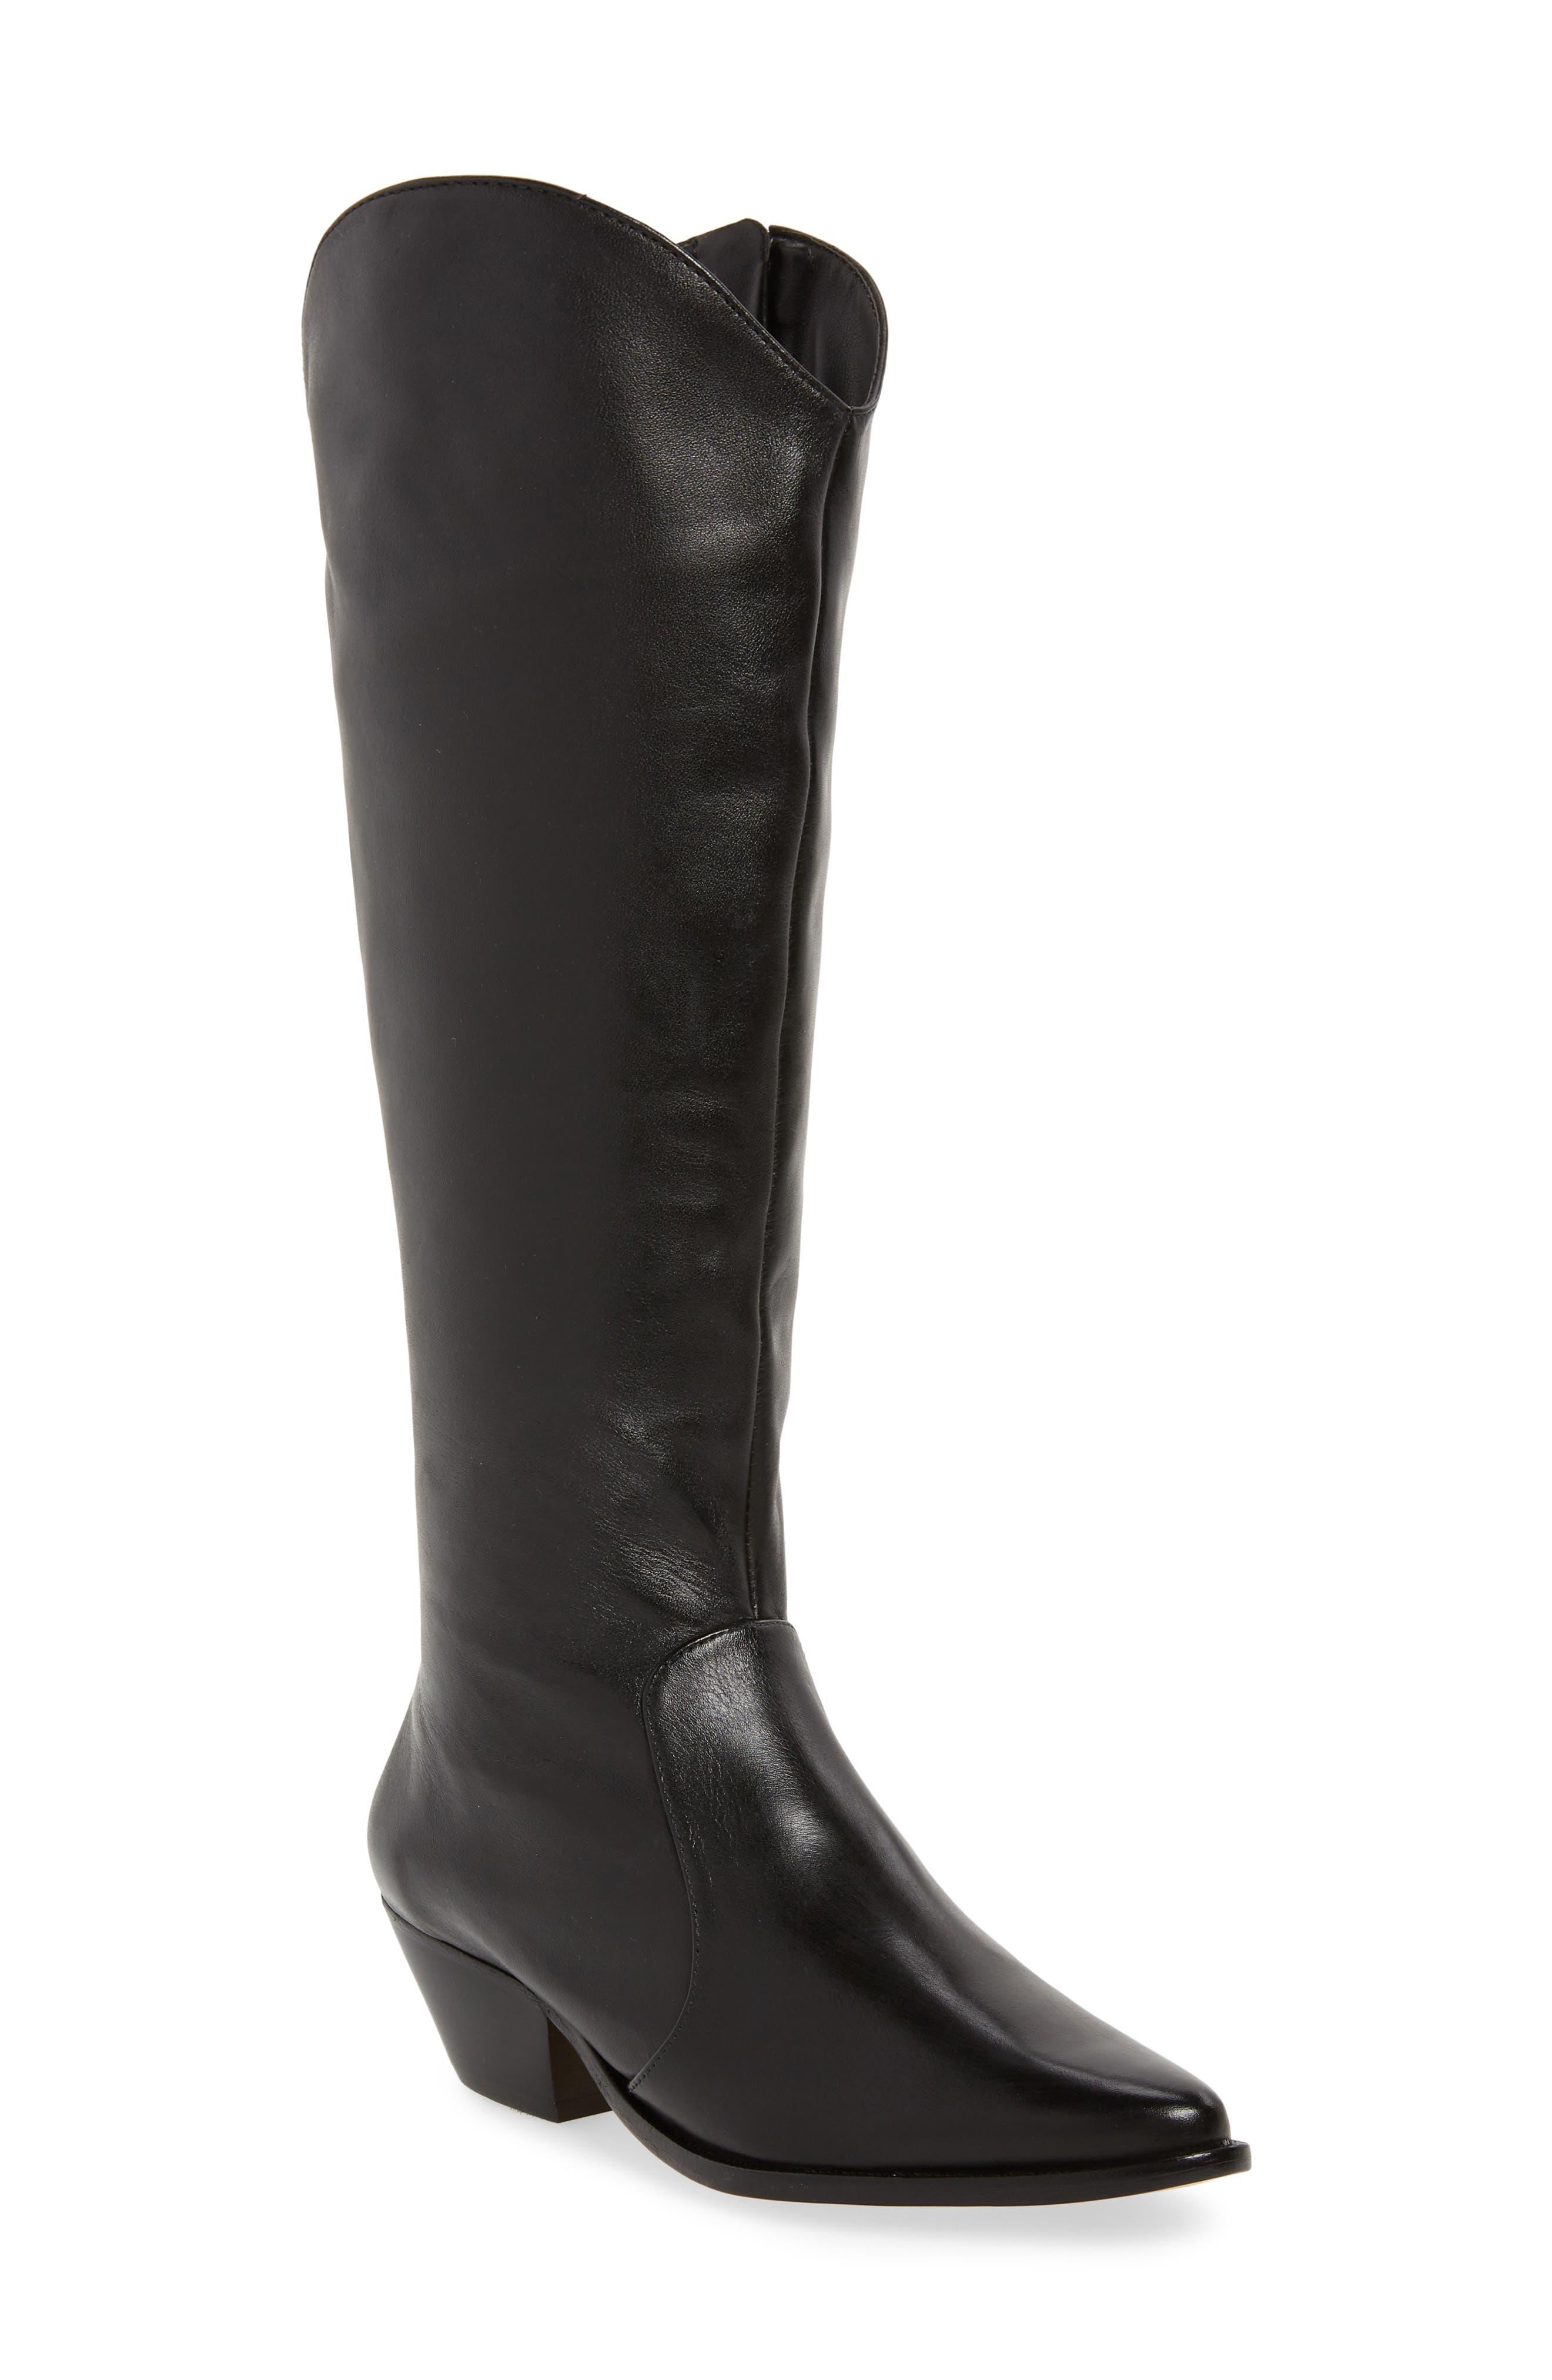 Fantinne Knee High Boot,                         Main,                         color, BLACK LEATHER